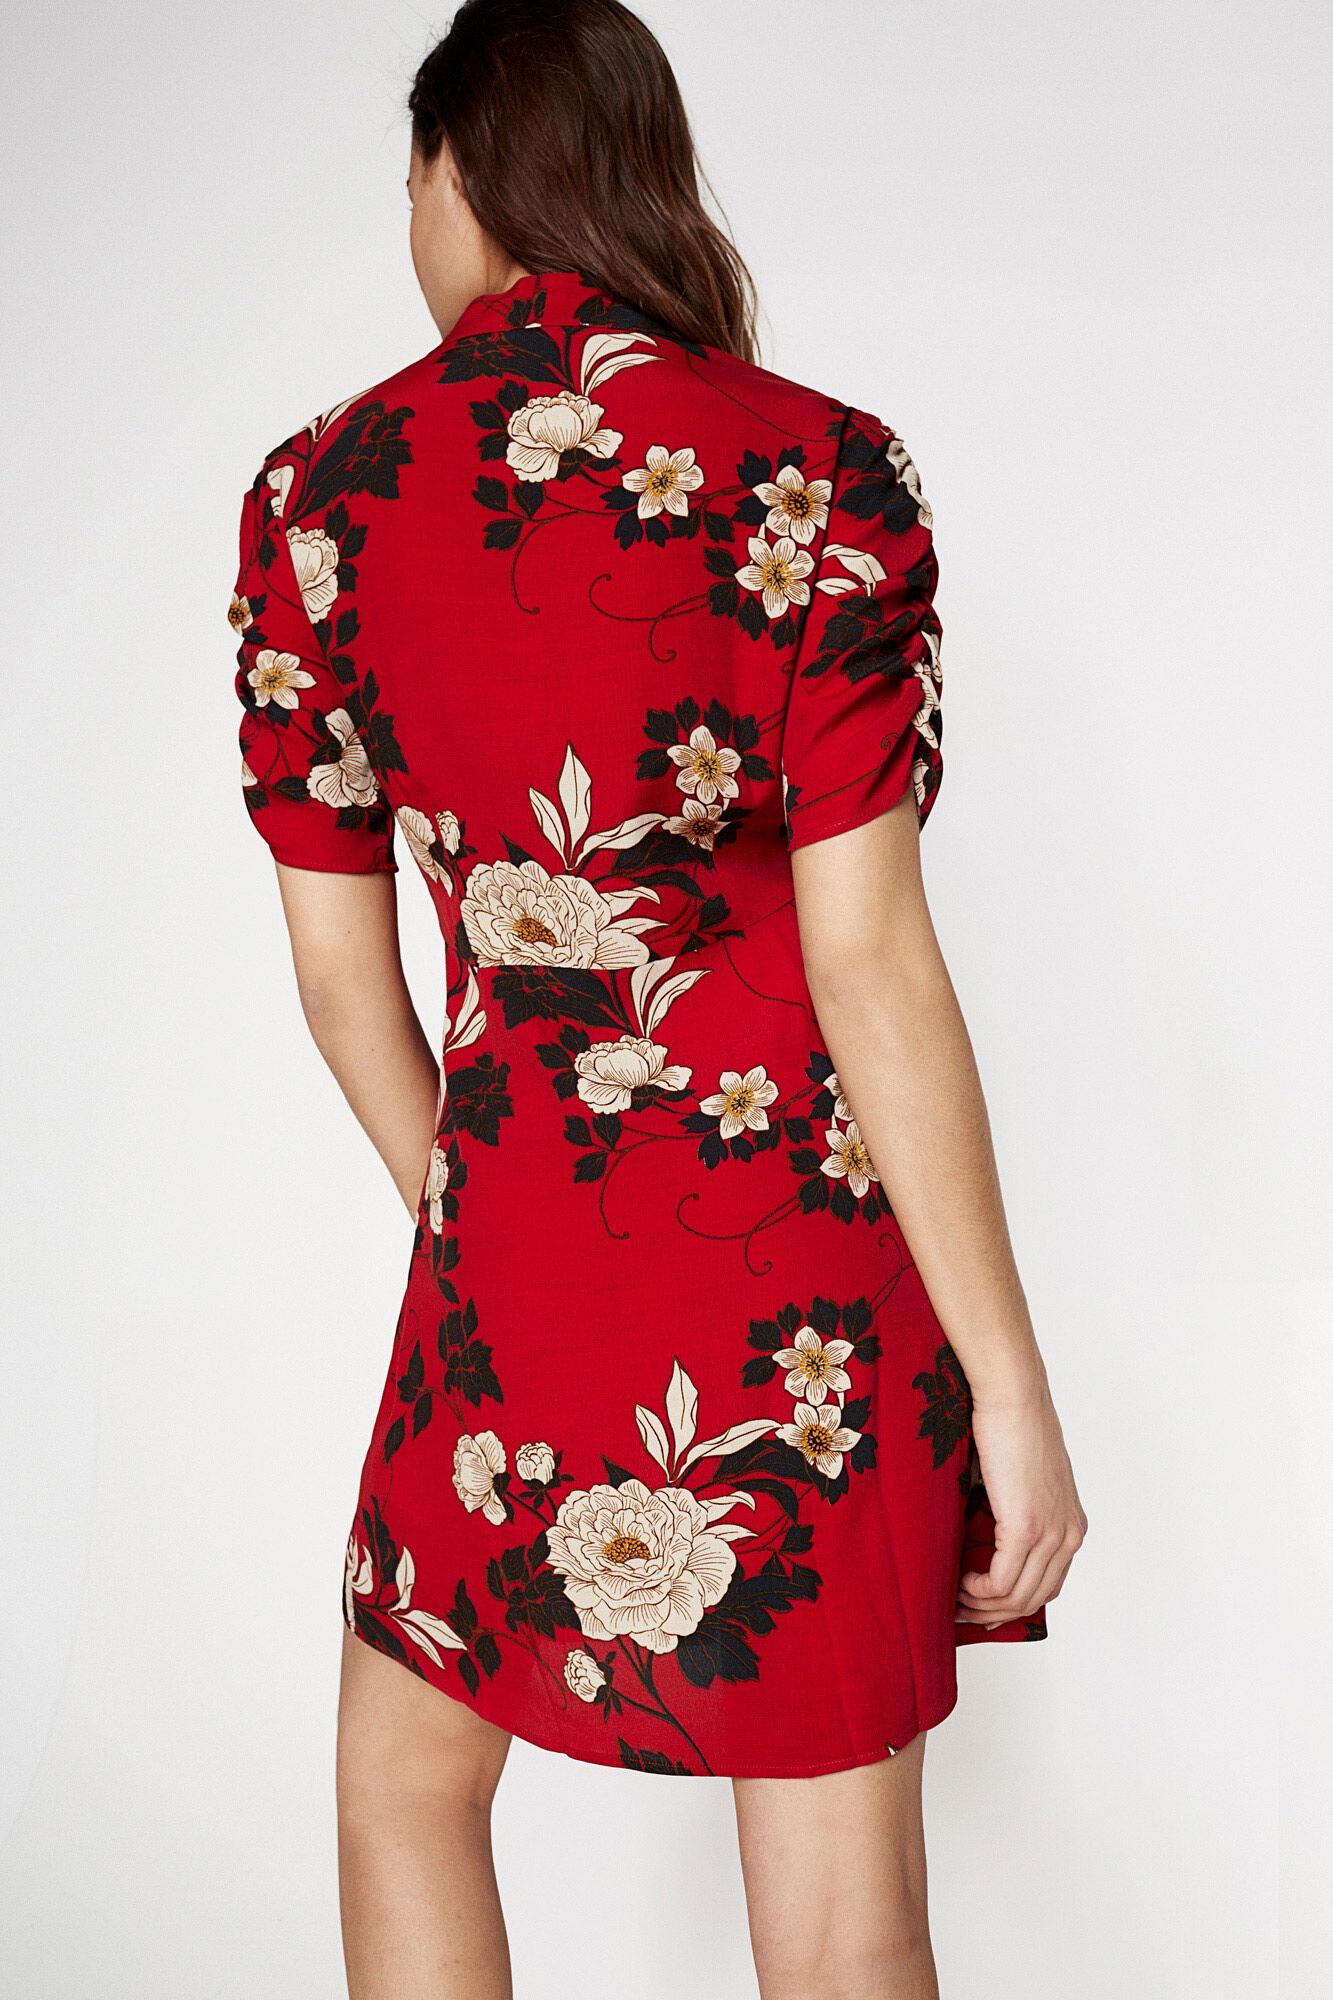 FLOWER PRINT RED DRESS | Dresses | Springfield Man & Woman